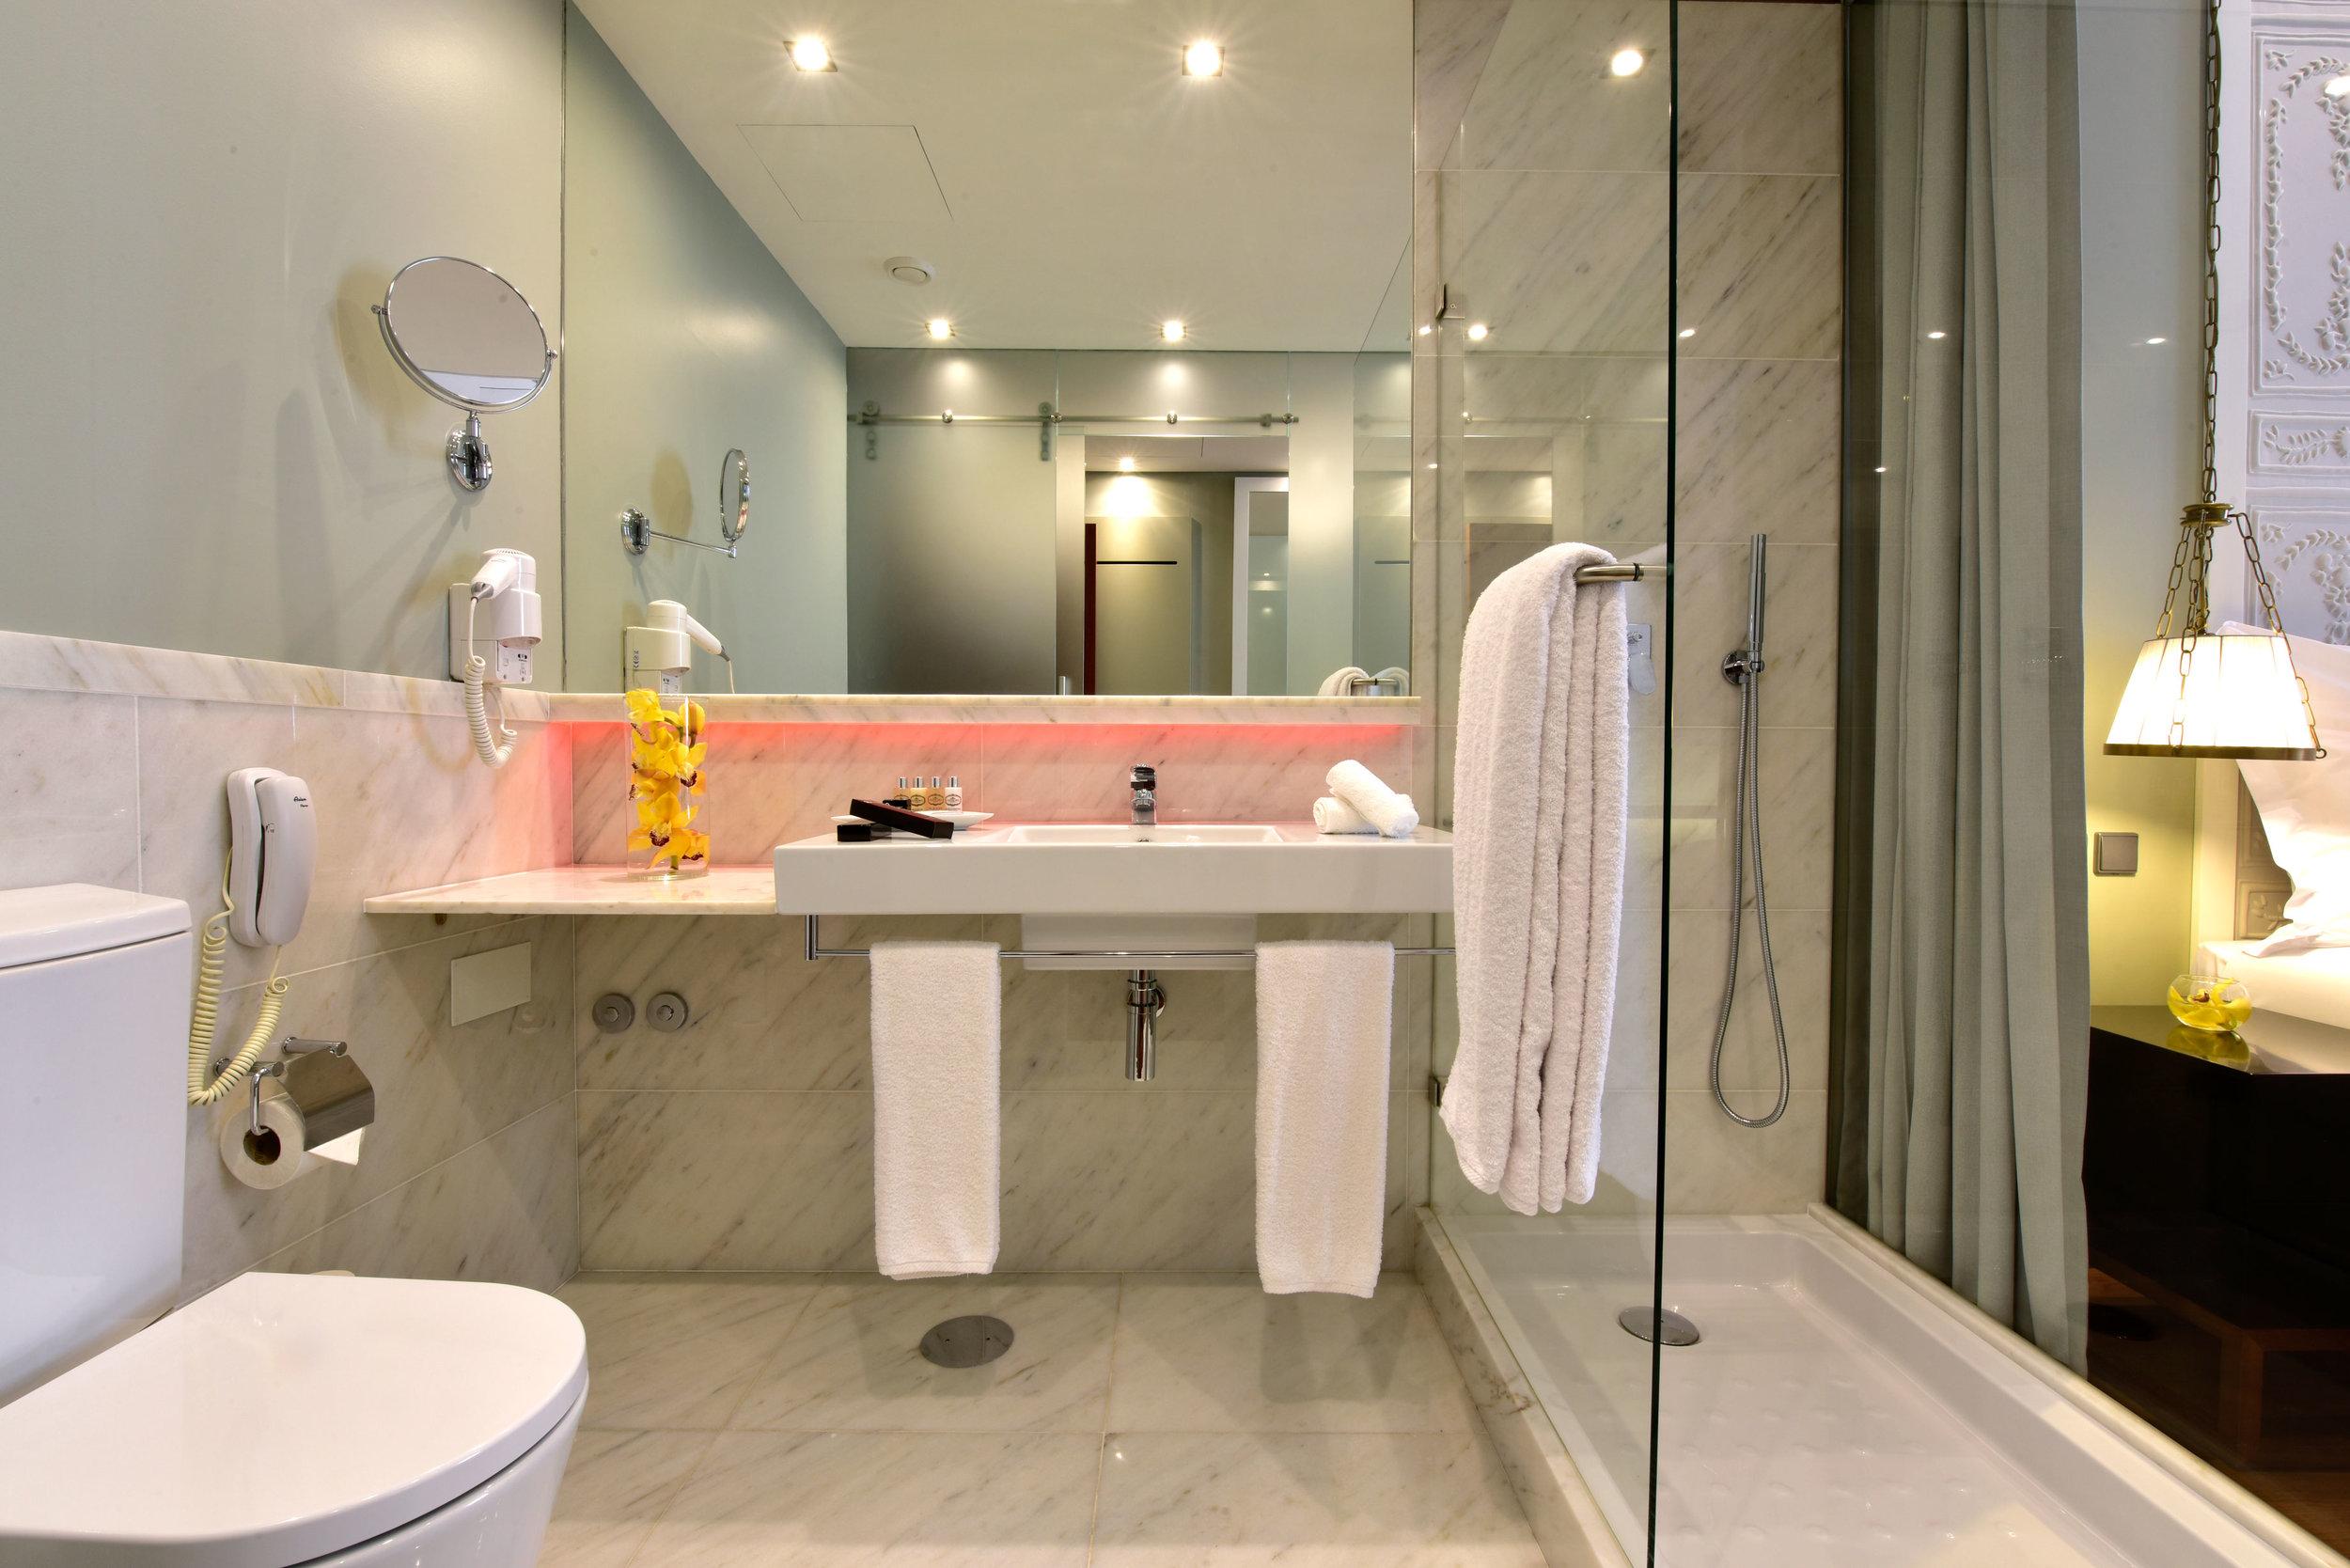 Pousada de Lisboa - Praca do C Guest Room Bathroom.jpg